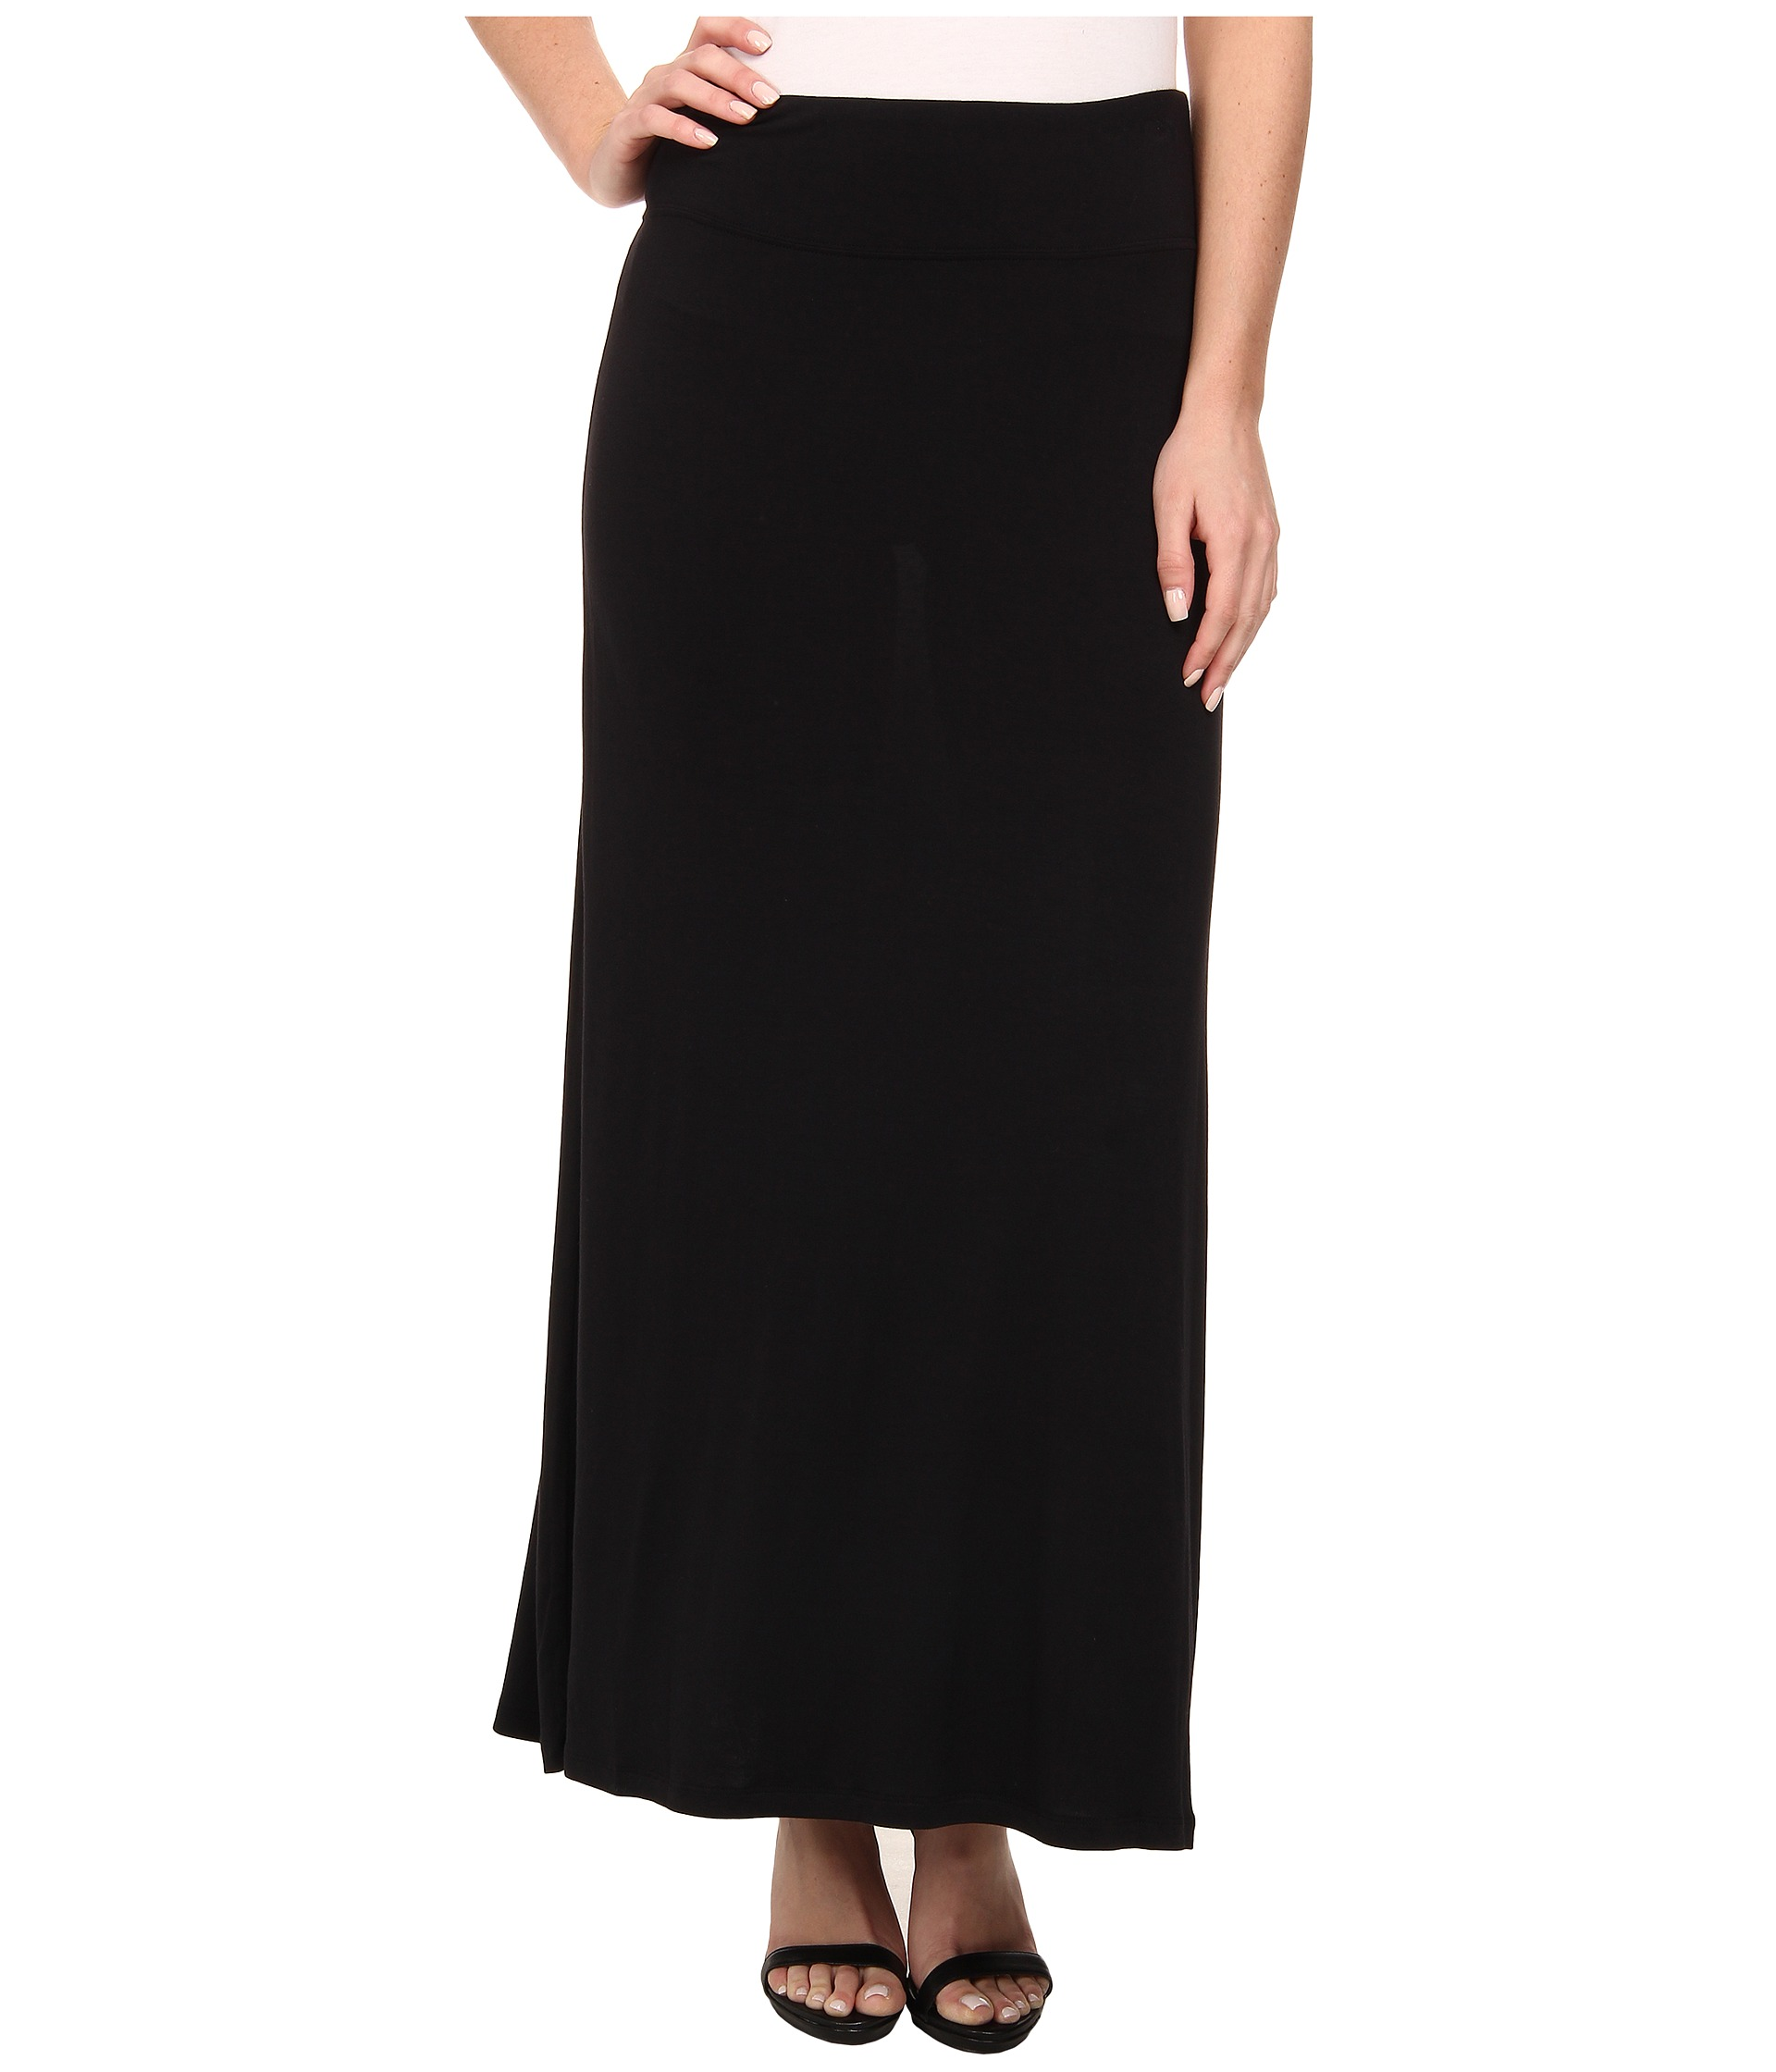 kensie light weight viscose spandex maxi skirt ks9k6s02 at